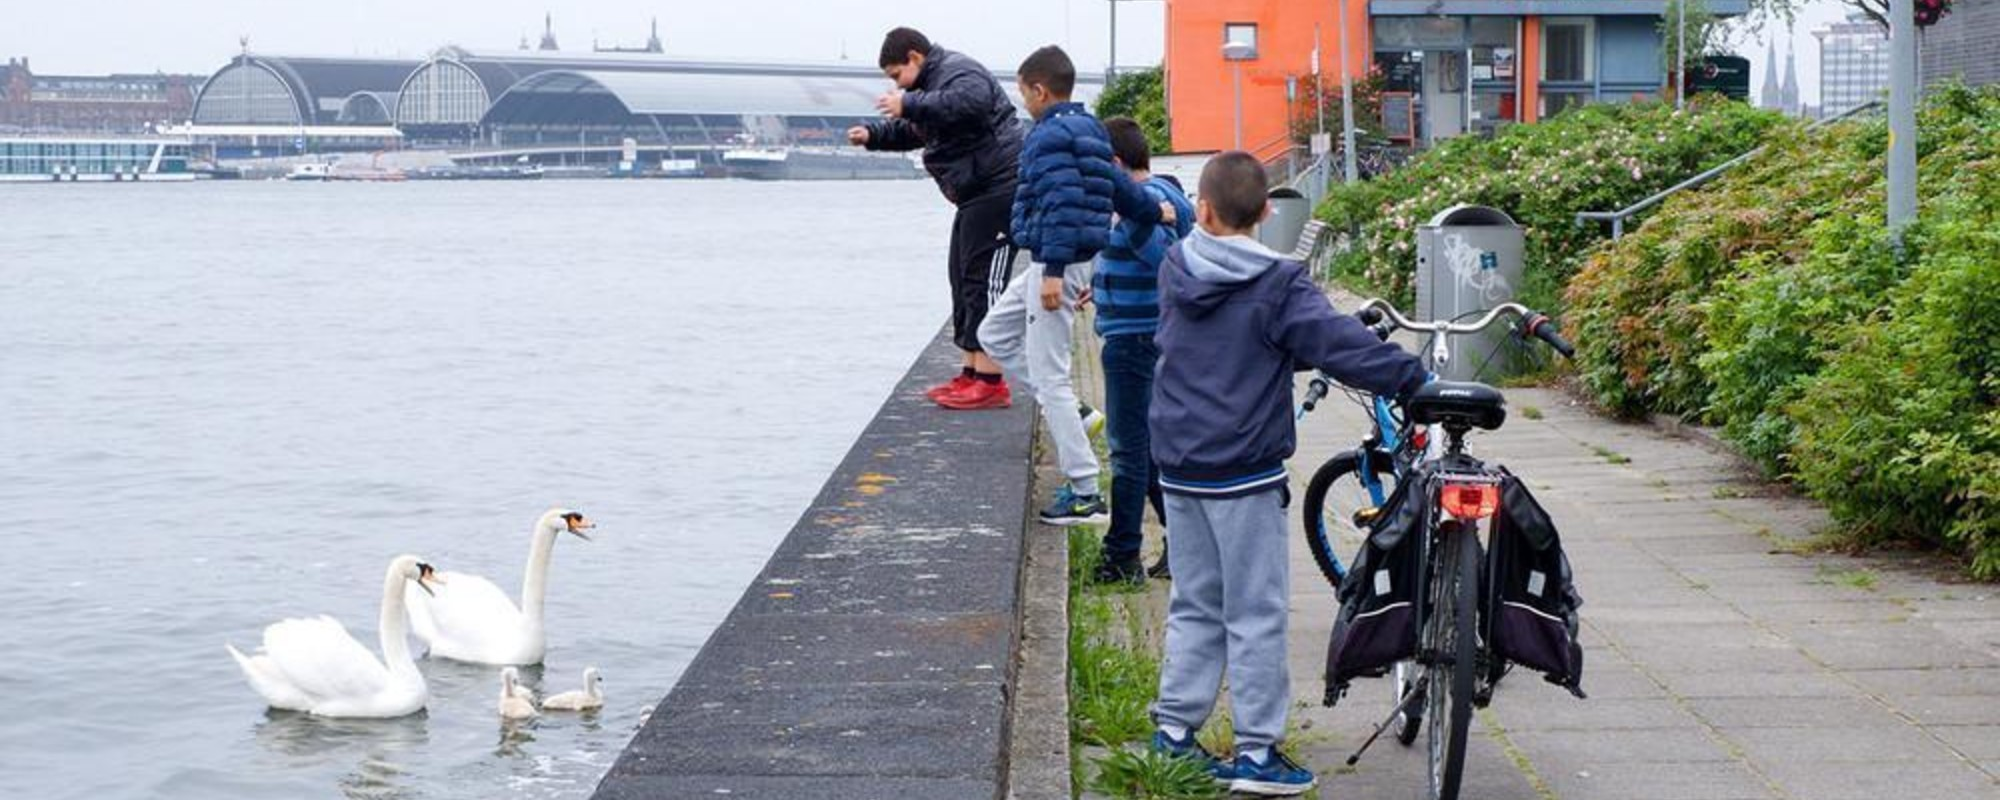 In Photos: Η Γειτονιά του Άμστερνταμ που από Ασχημόπαπο Έγινε Κύκνος